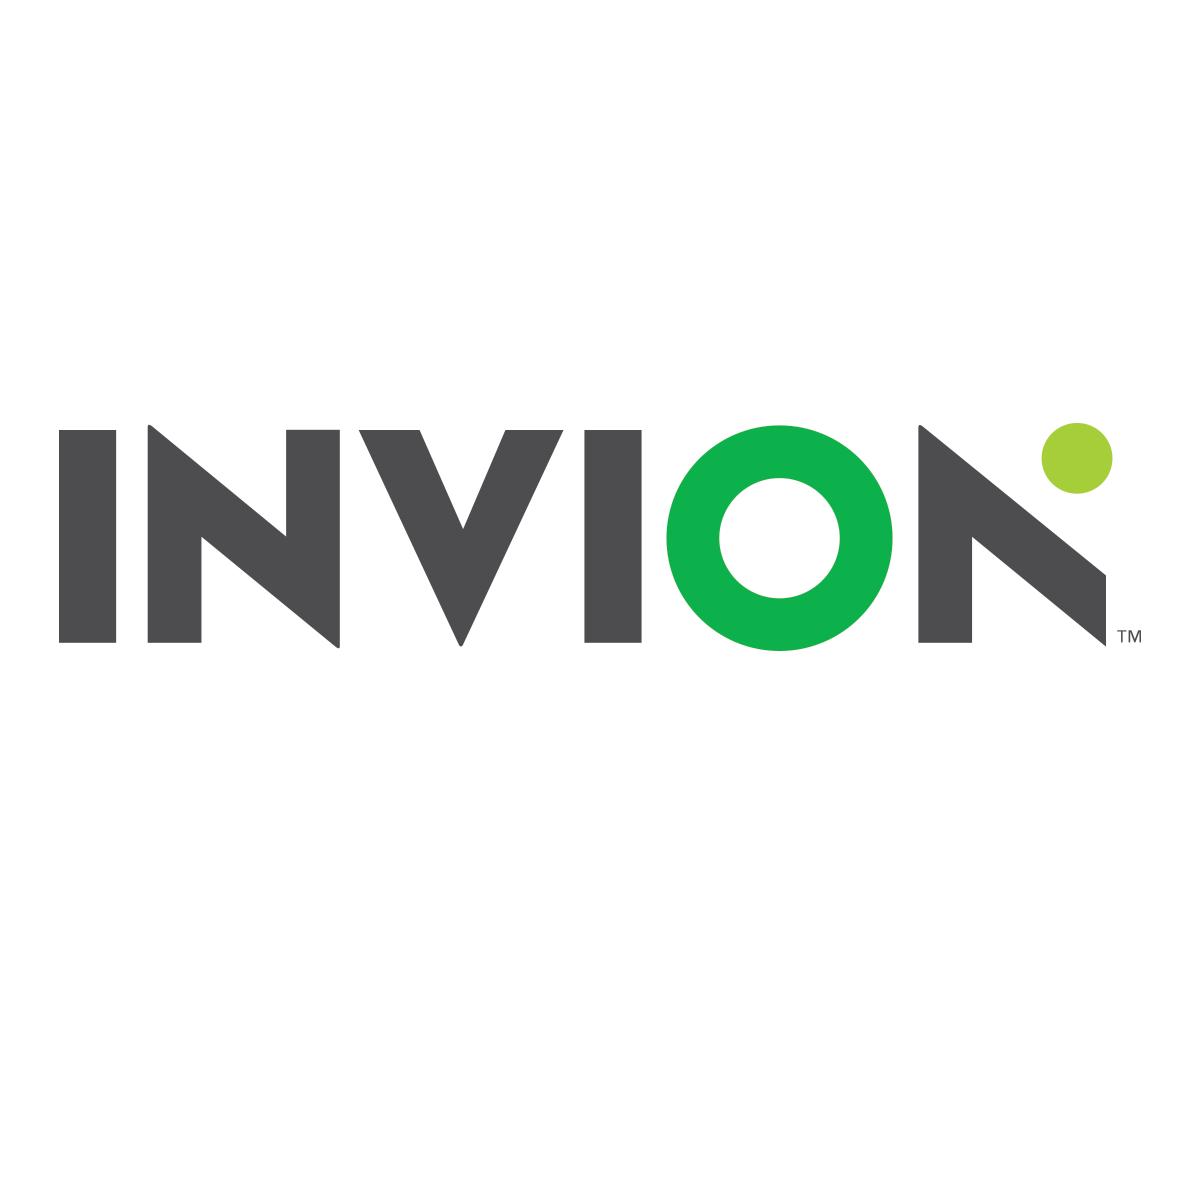 Invion Branding